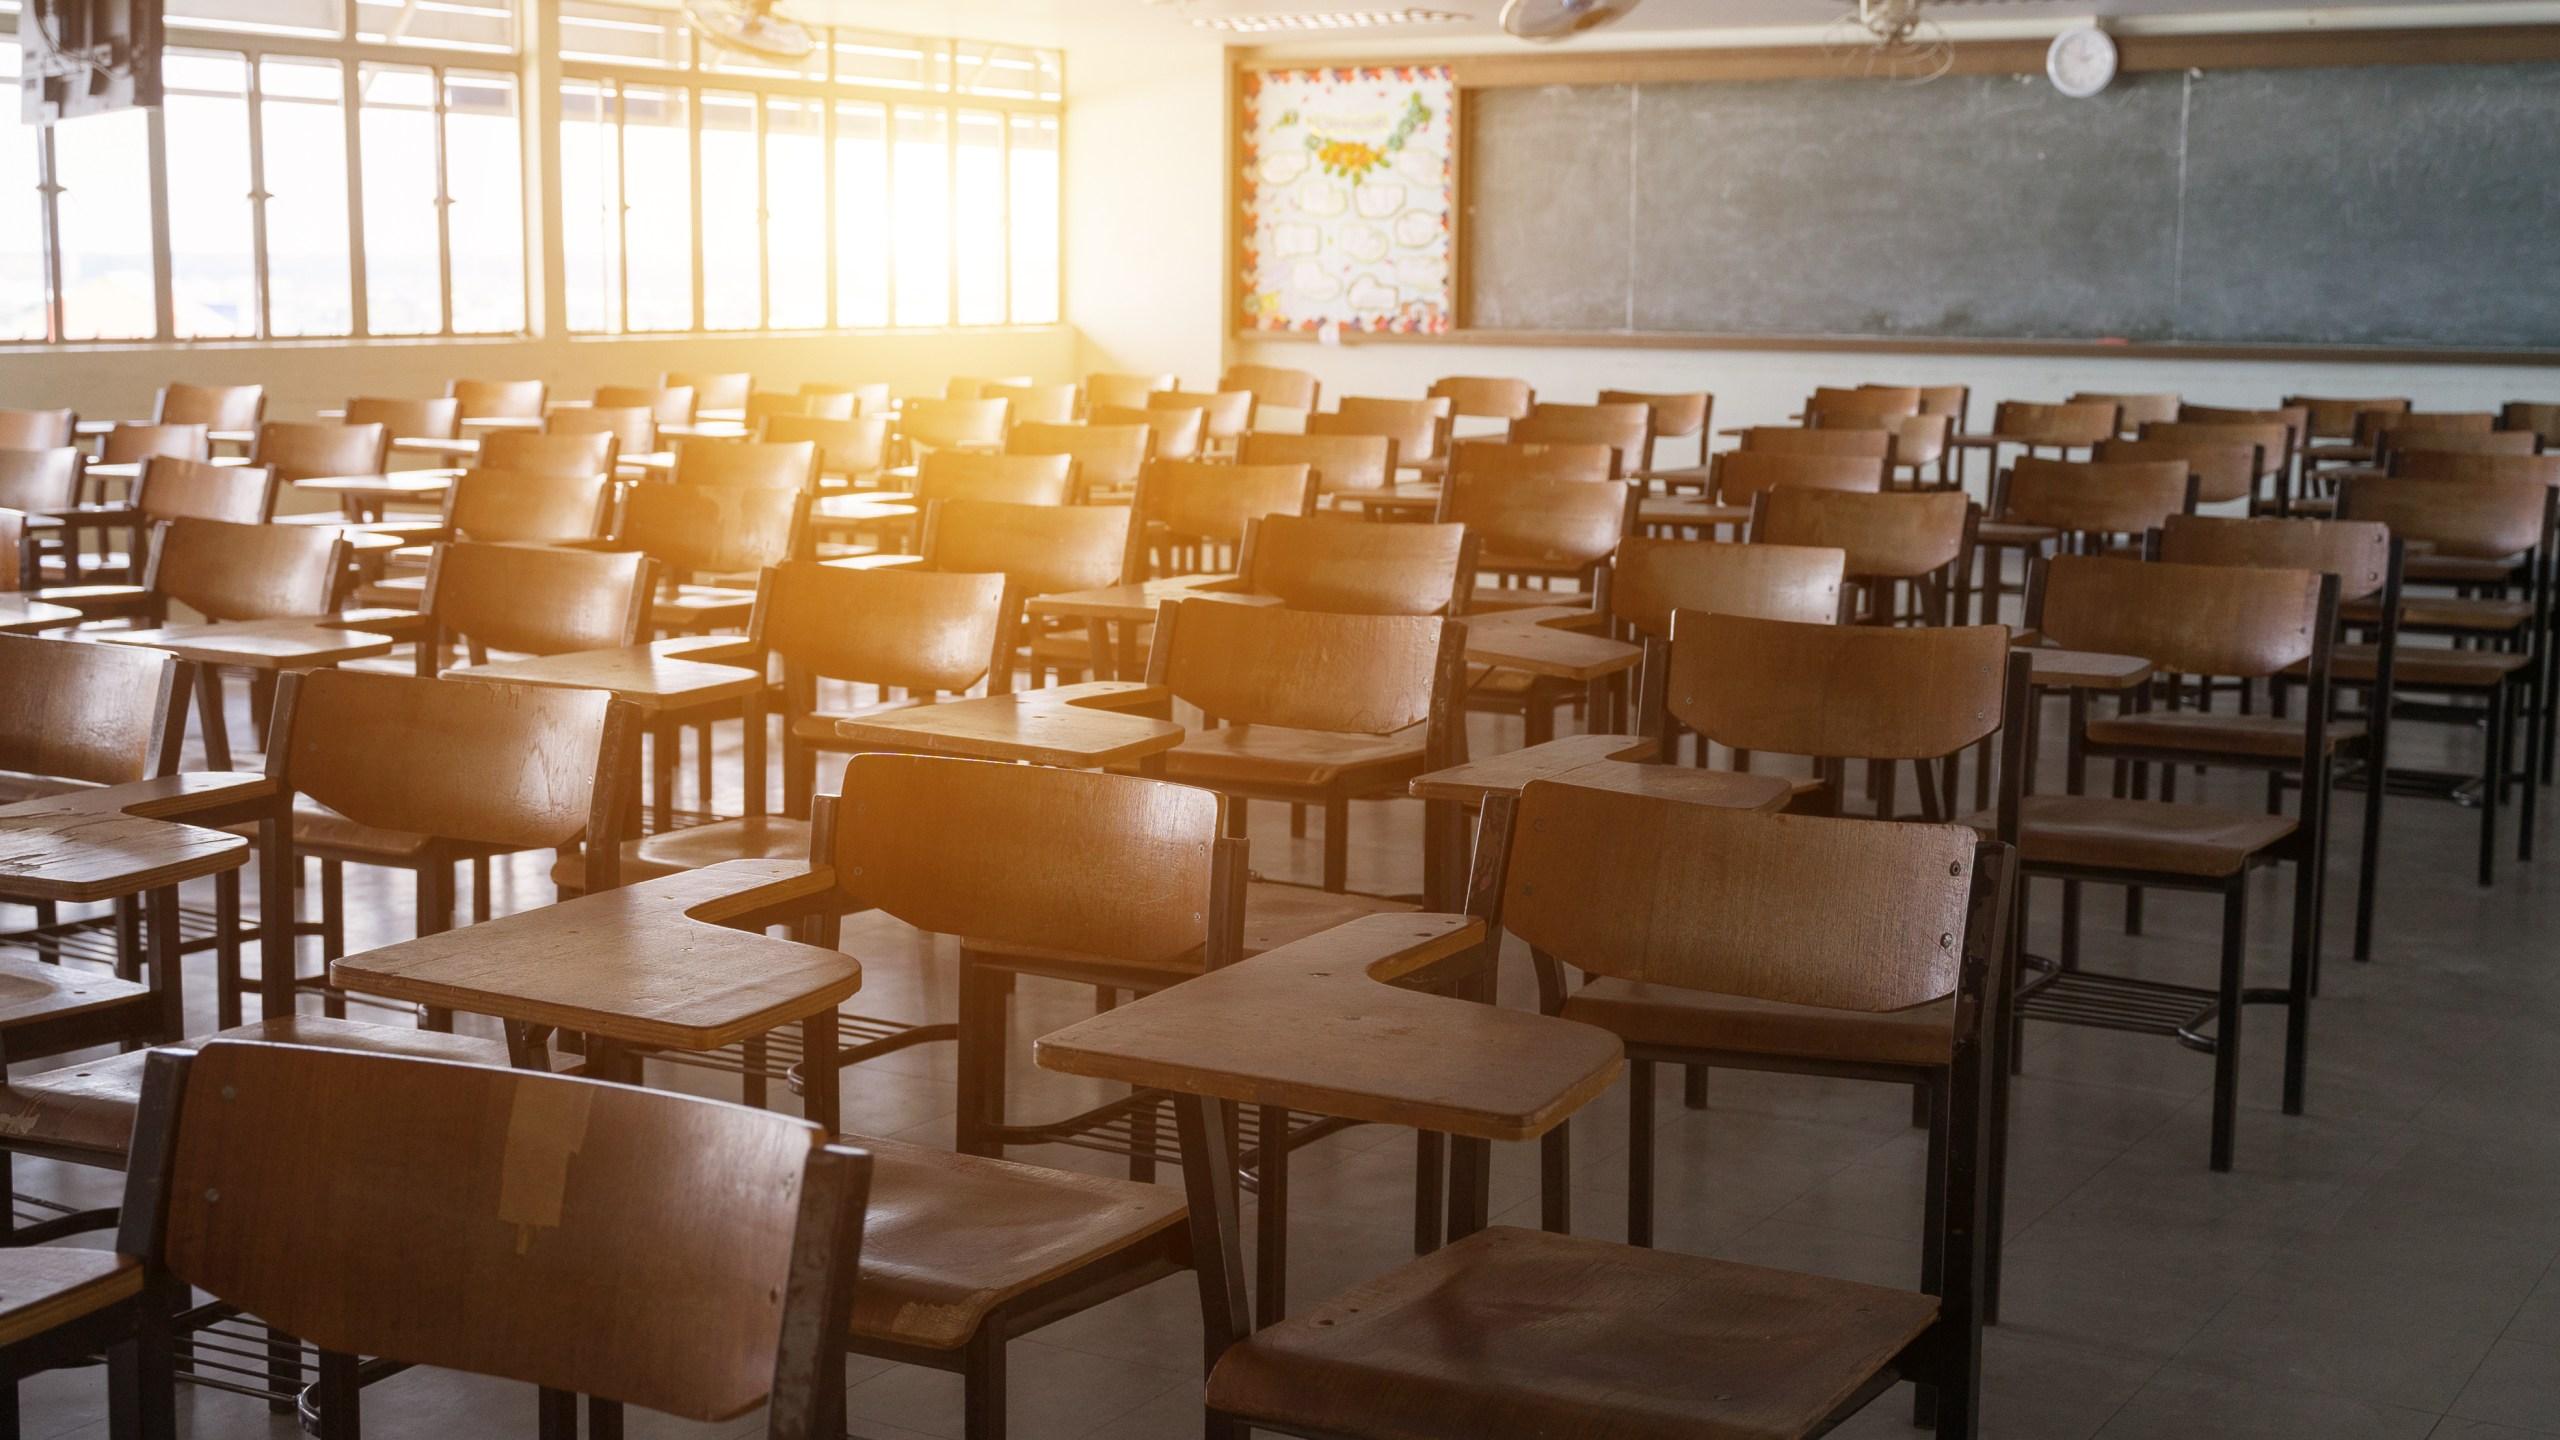 32 New Mexico Public Schools Make It Onto Covid 19 Watchlist Krqe News 13